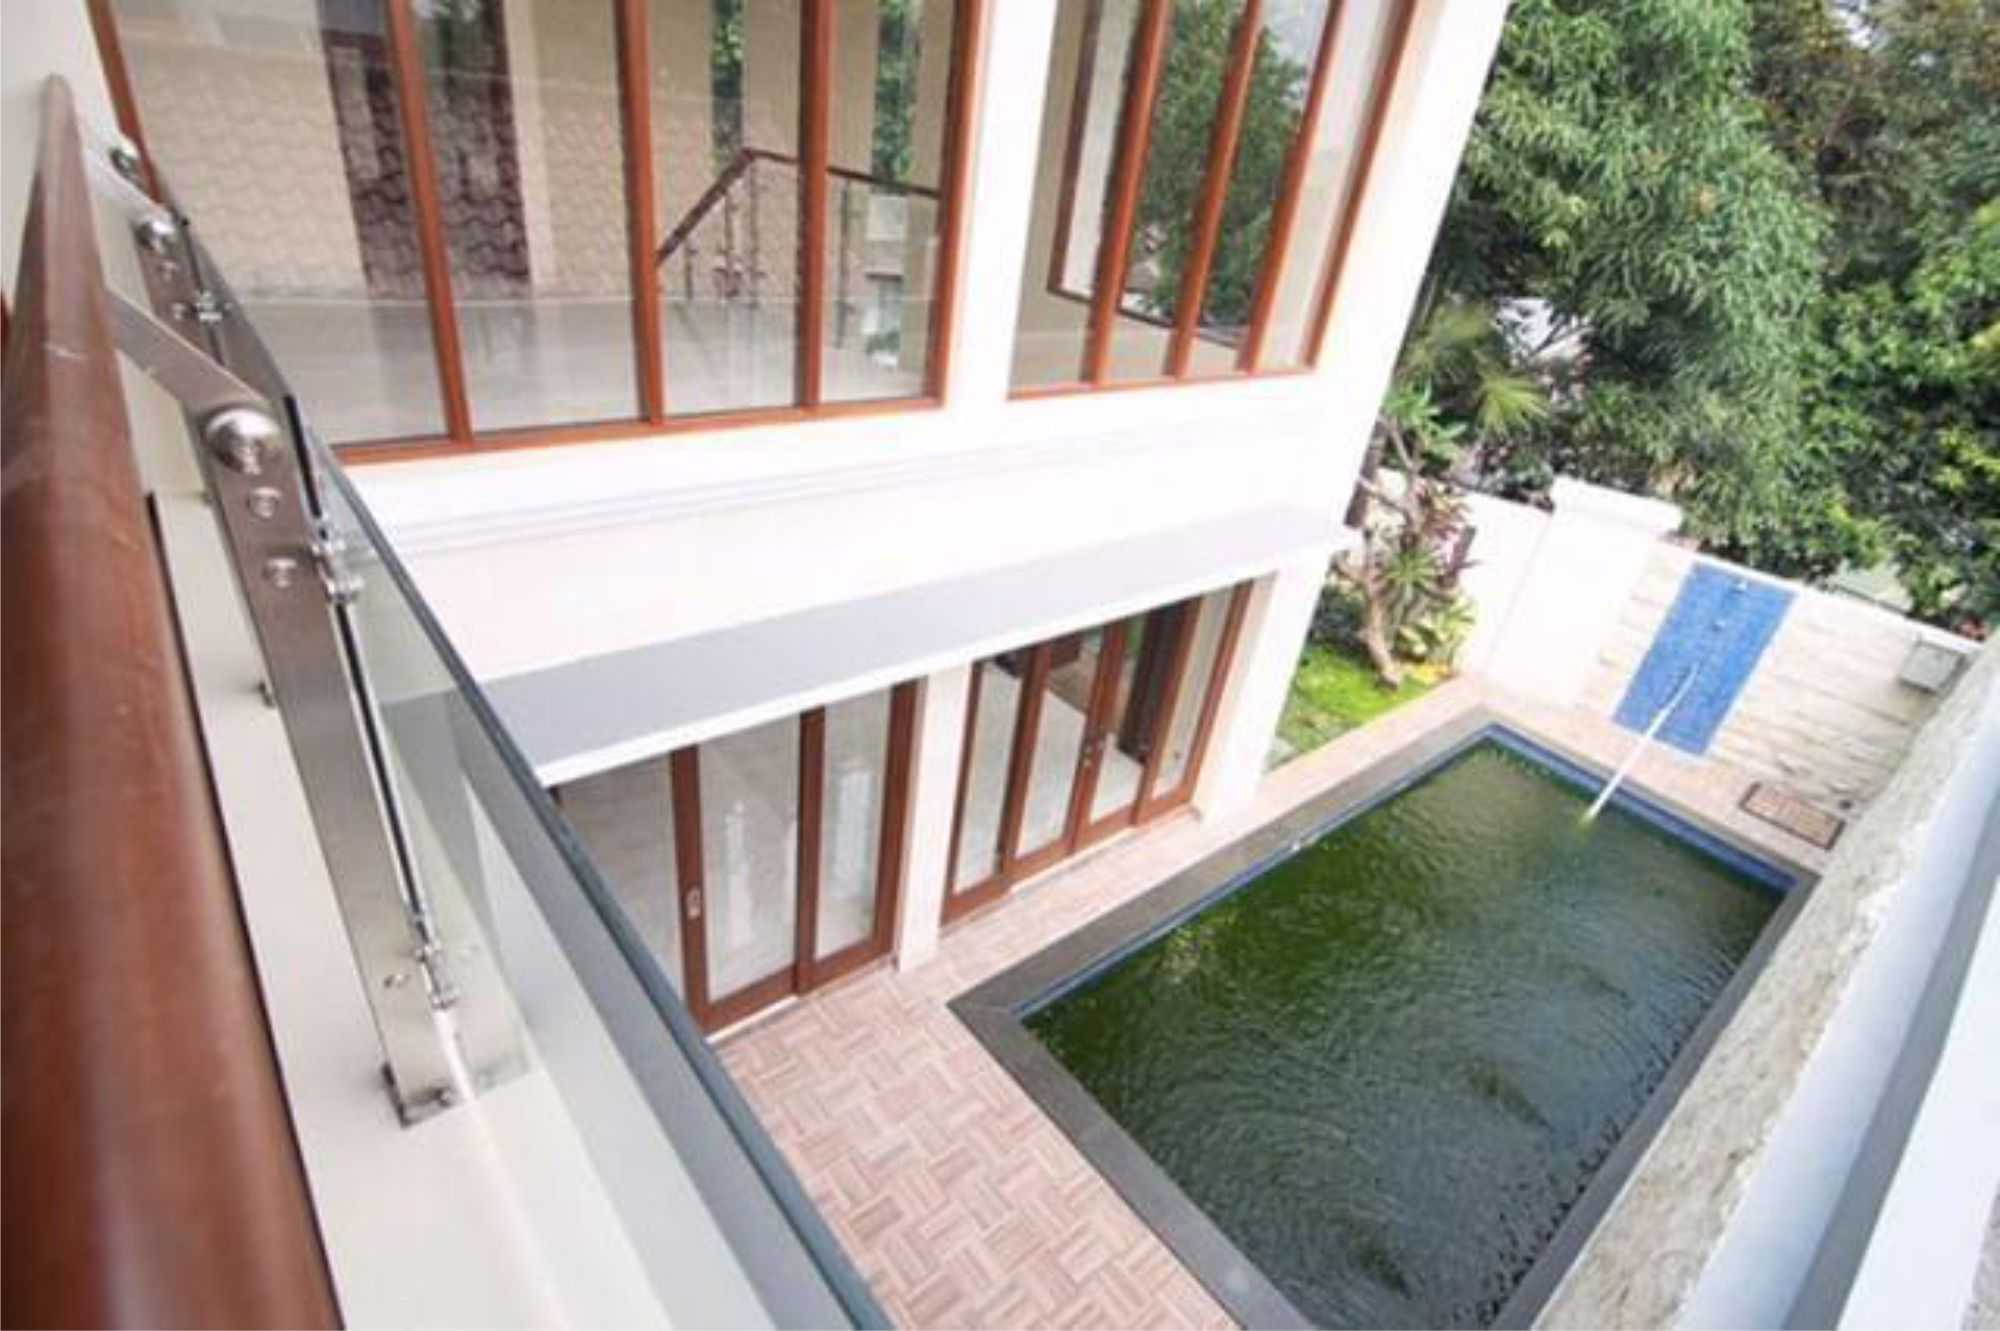 Emporio Architect Progress Konstruksi Rumah Villa Bali Tropis 385 @ Jakarta Jakarta, Daerah Khusus Ibukota Jakarta, Indonesia Jakarta, Daerah Khusus Ibukota Jakarta, Indonesia Emporio-Architect-Progress-Konstruksi-Rumah-Villa-Bali-Tropis-385-Jakarta  76586